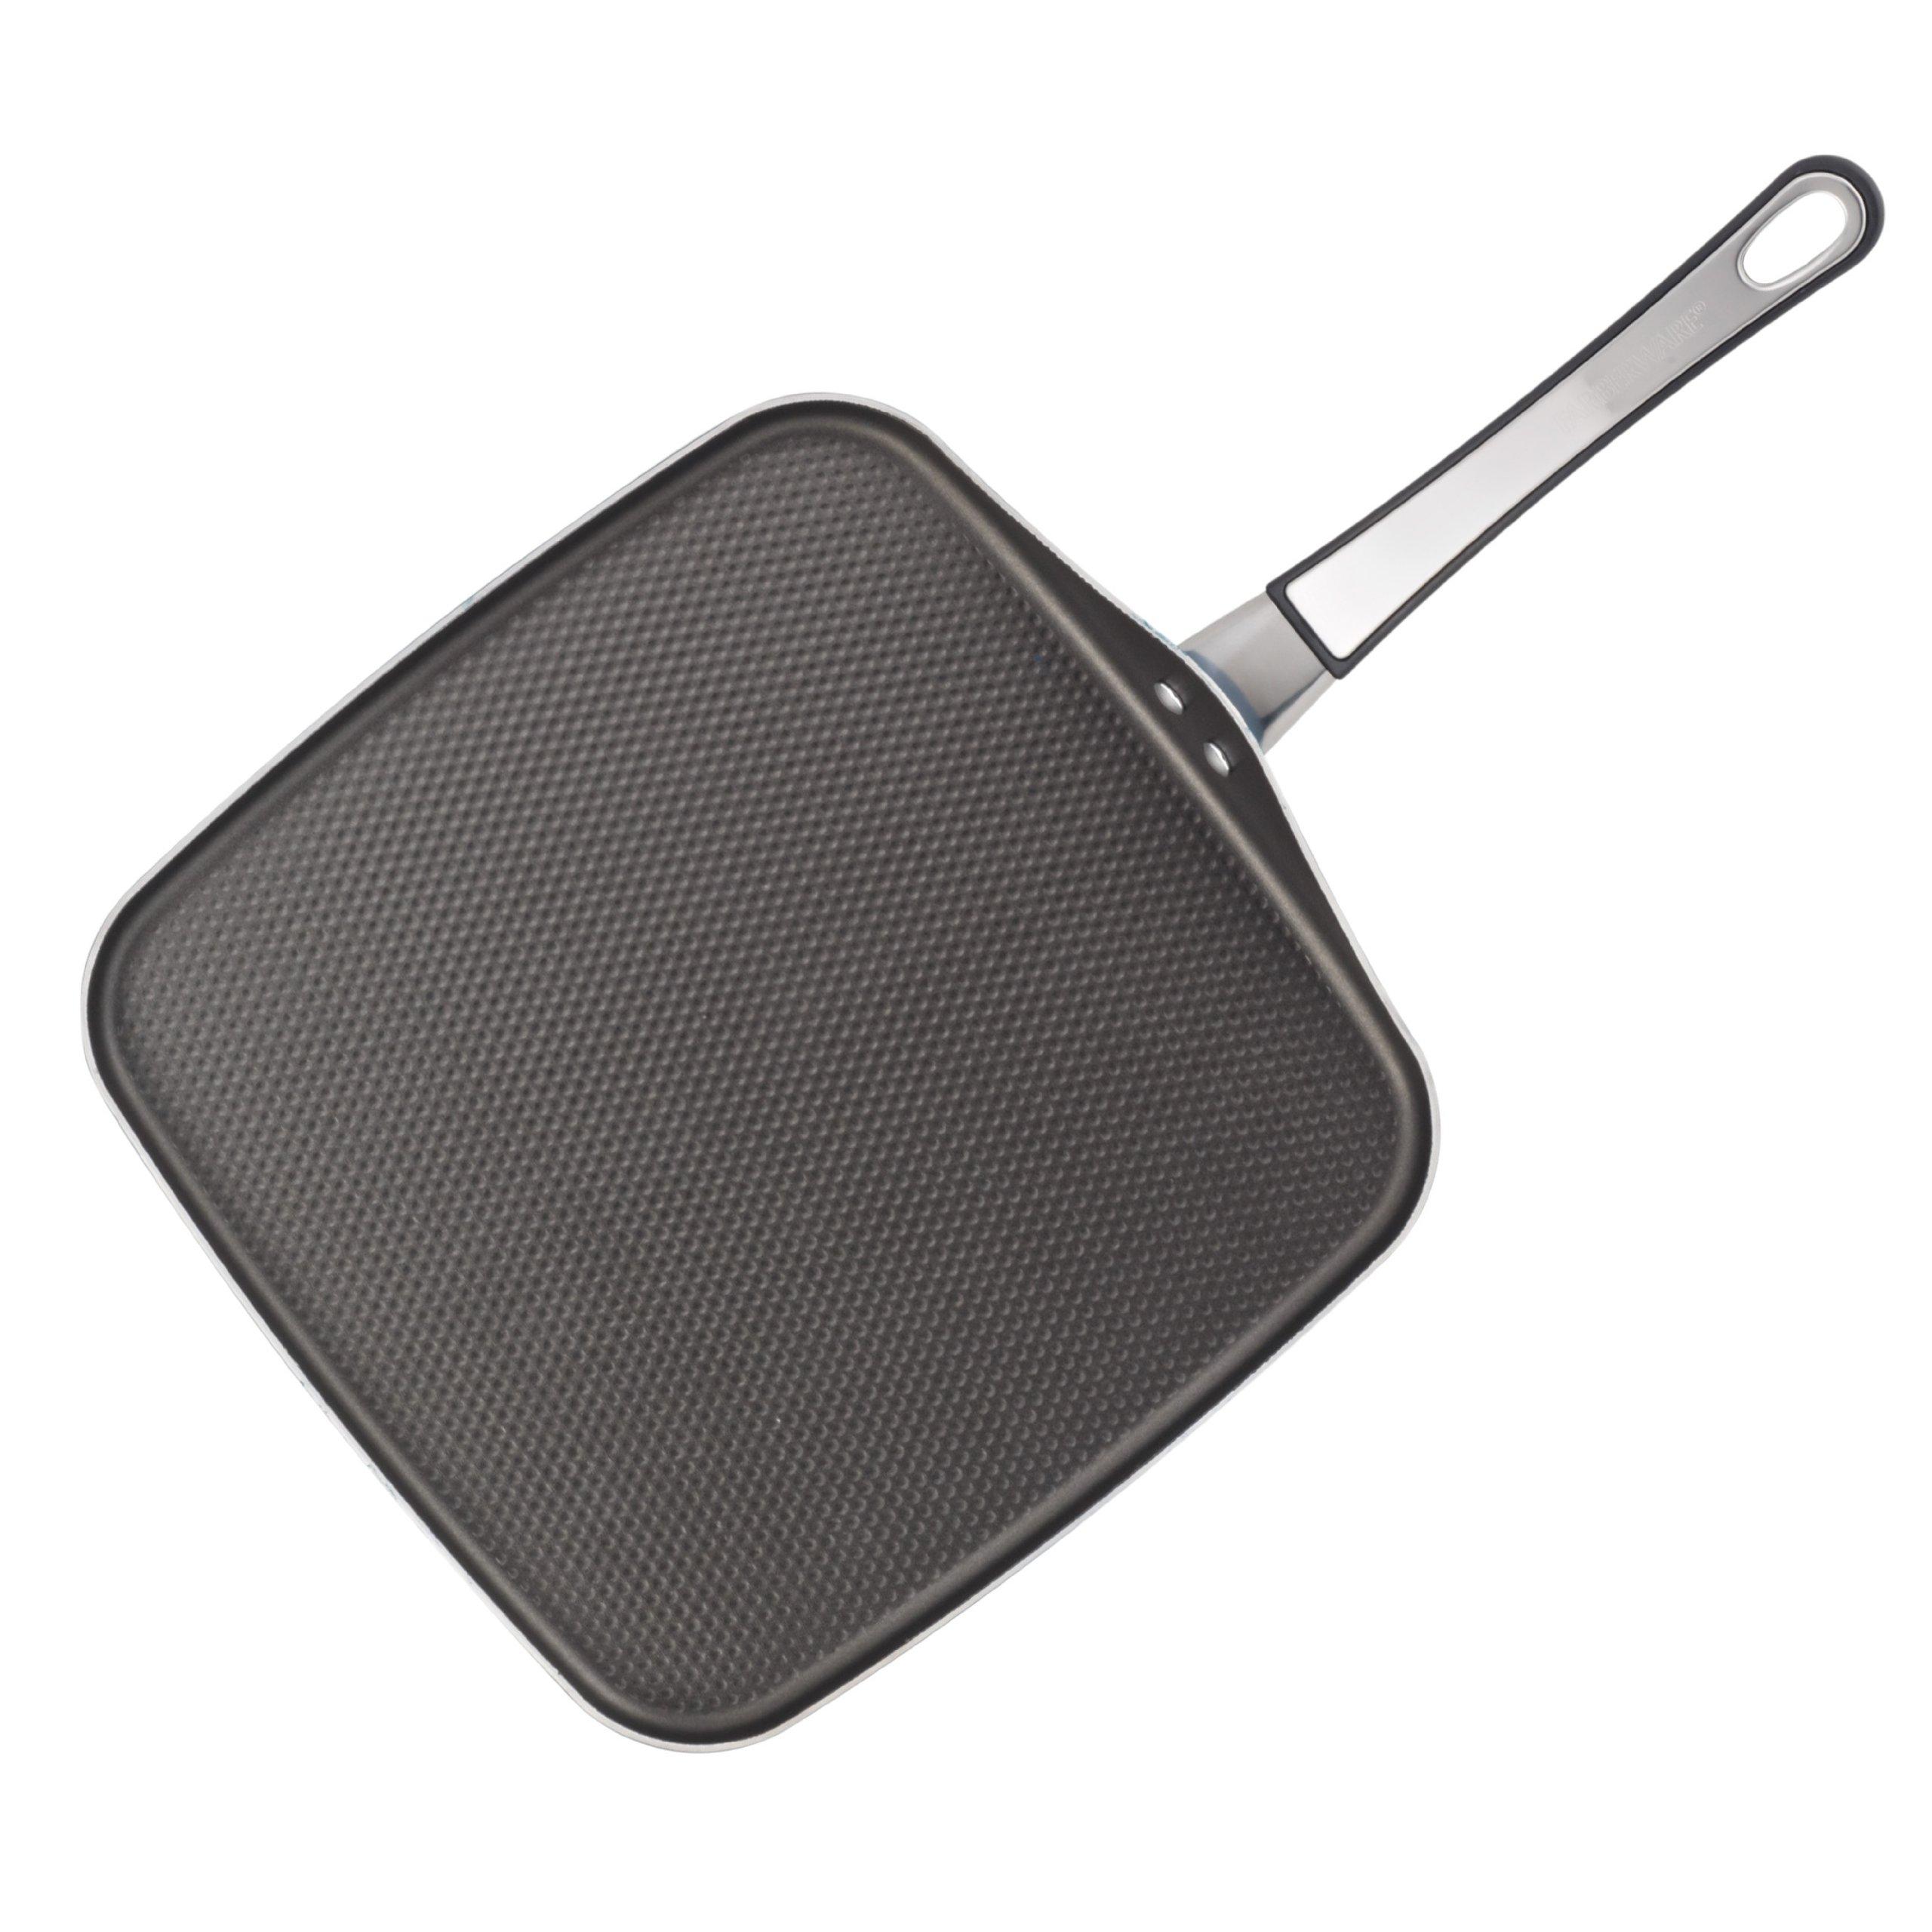 Farberware High Performance Nonstick Aluminum 11-Inch Square Griddle, Black by Farberware (Image #3)